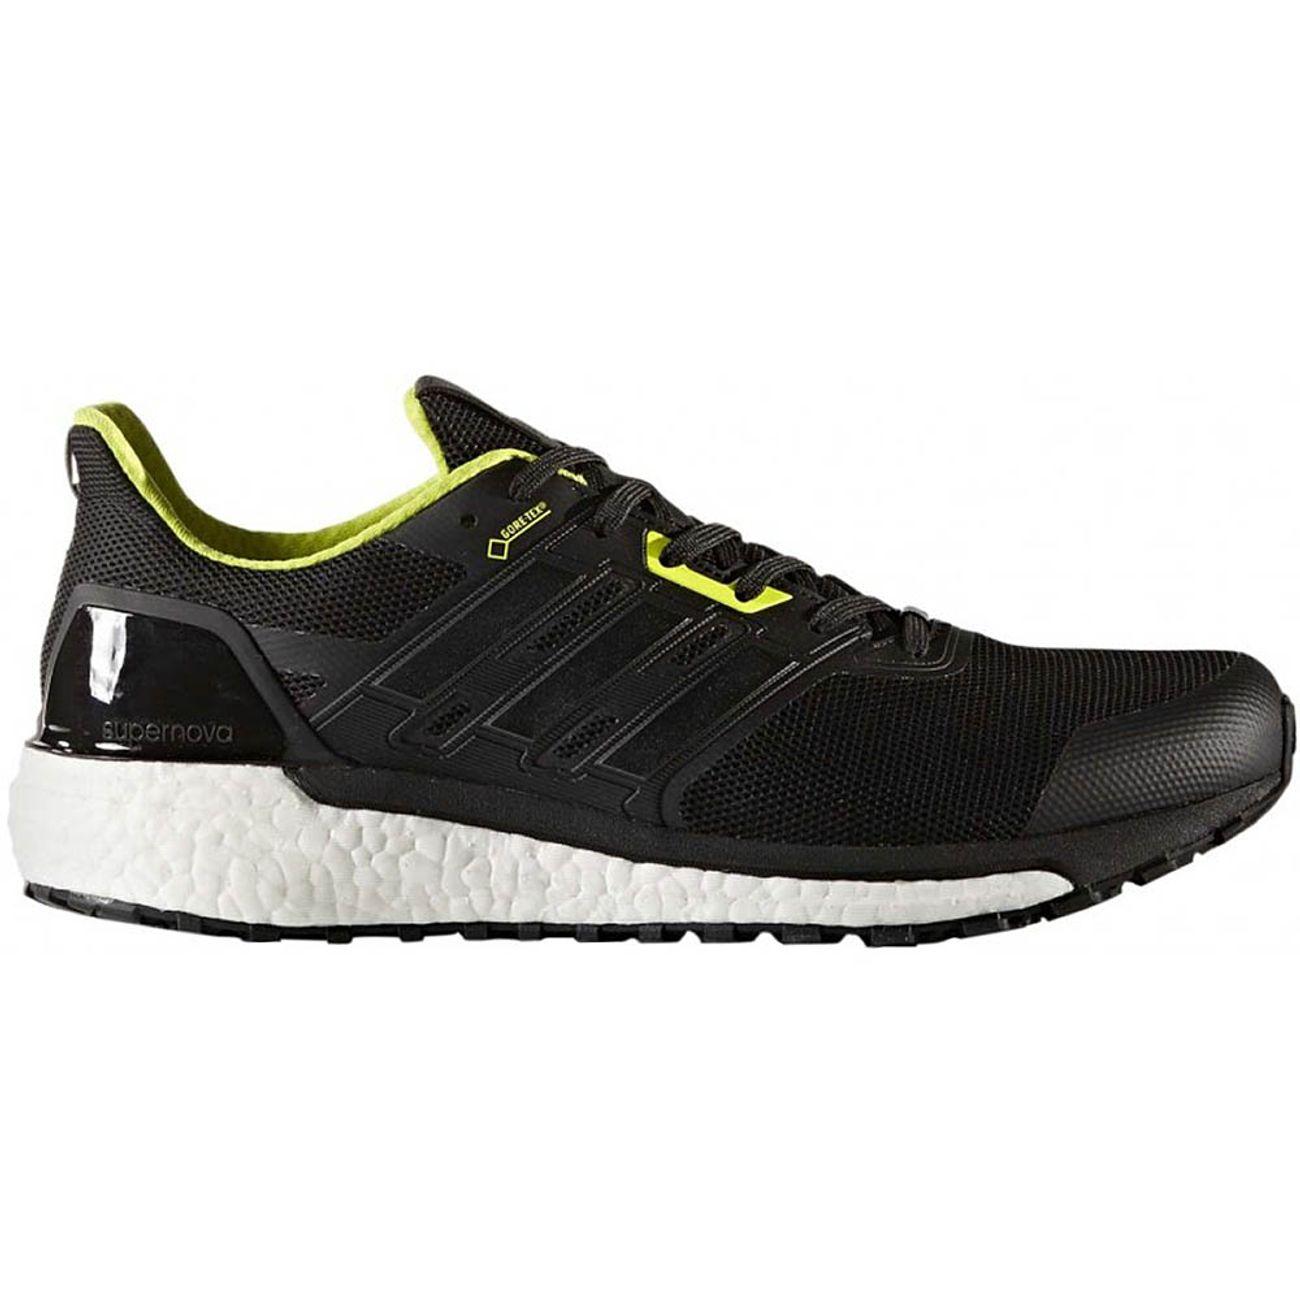 De Course Pied Homme Neutral Gtx À Supernova Adidas Black Chaussure XPkwO08n